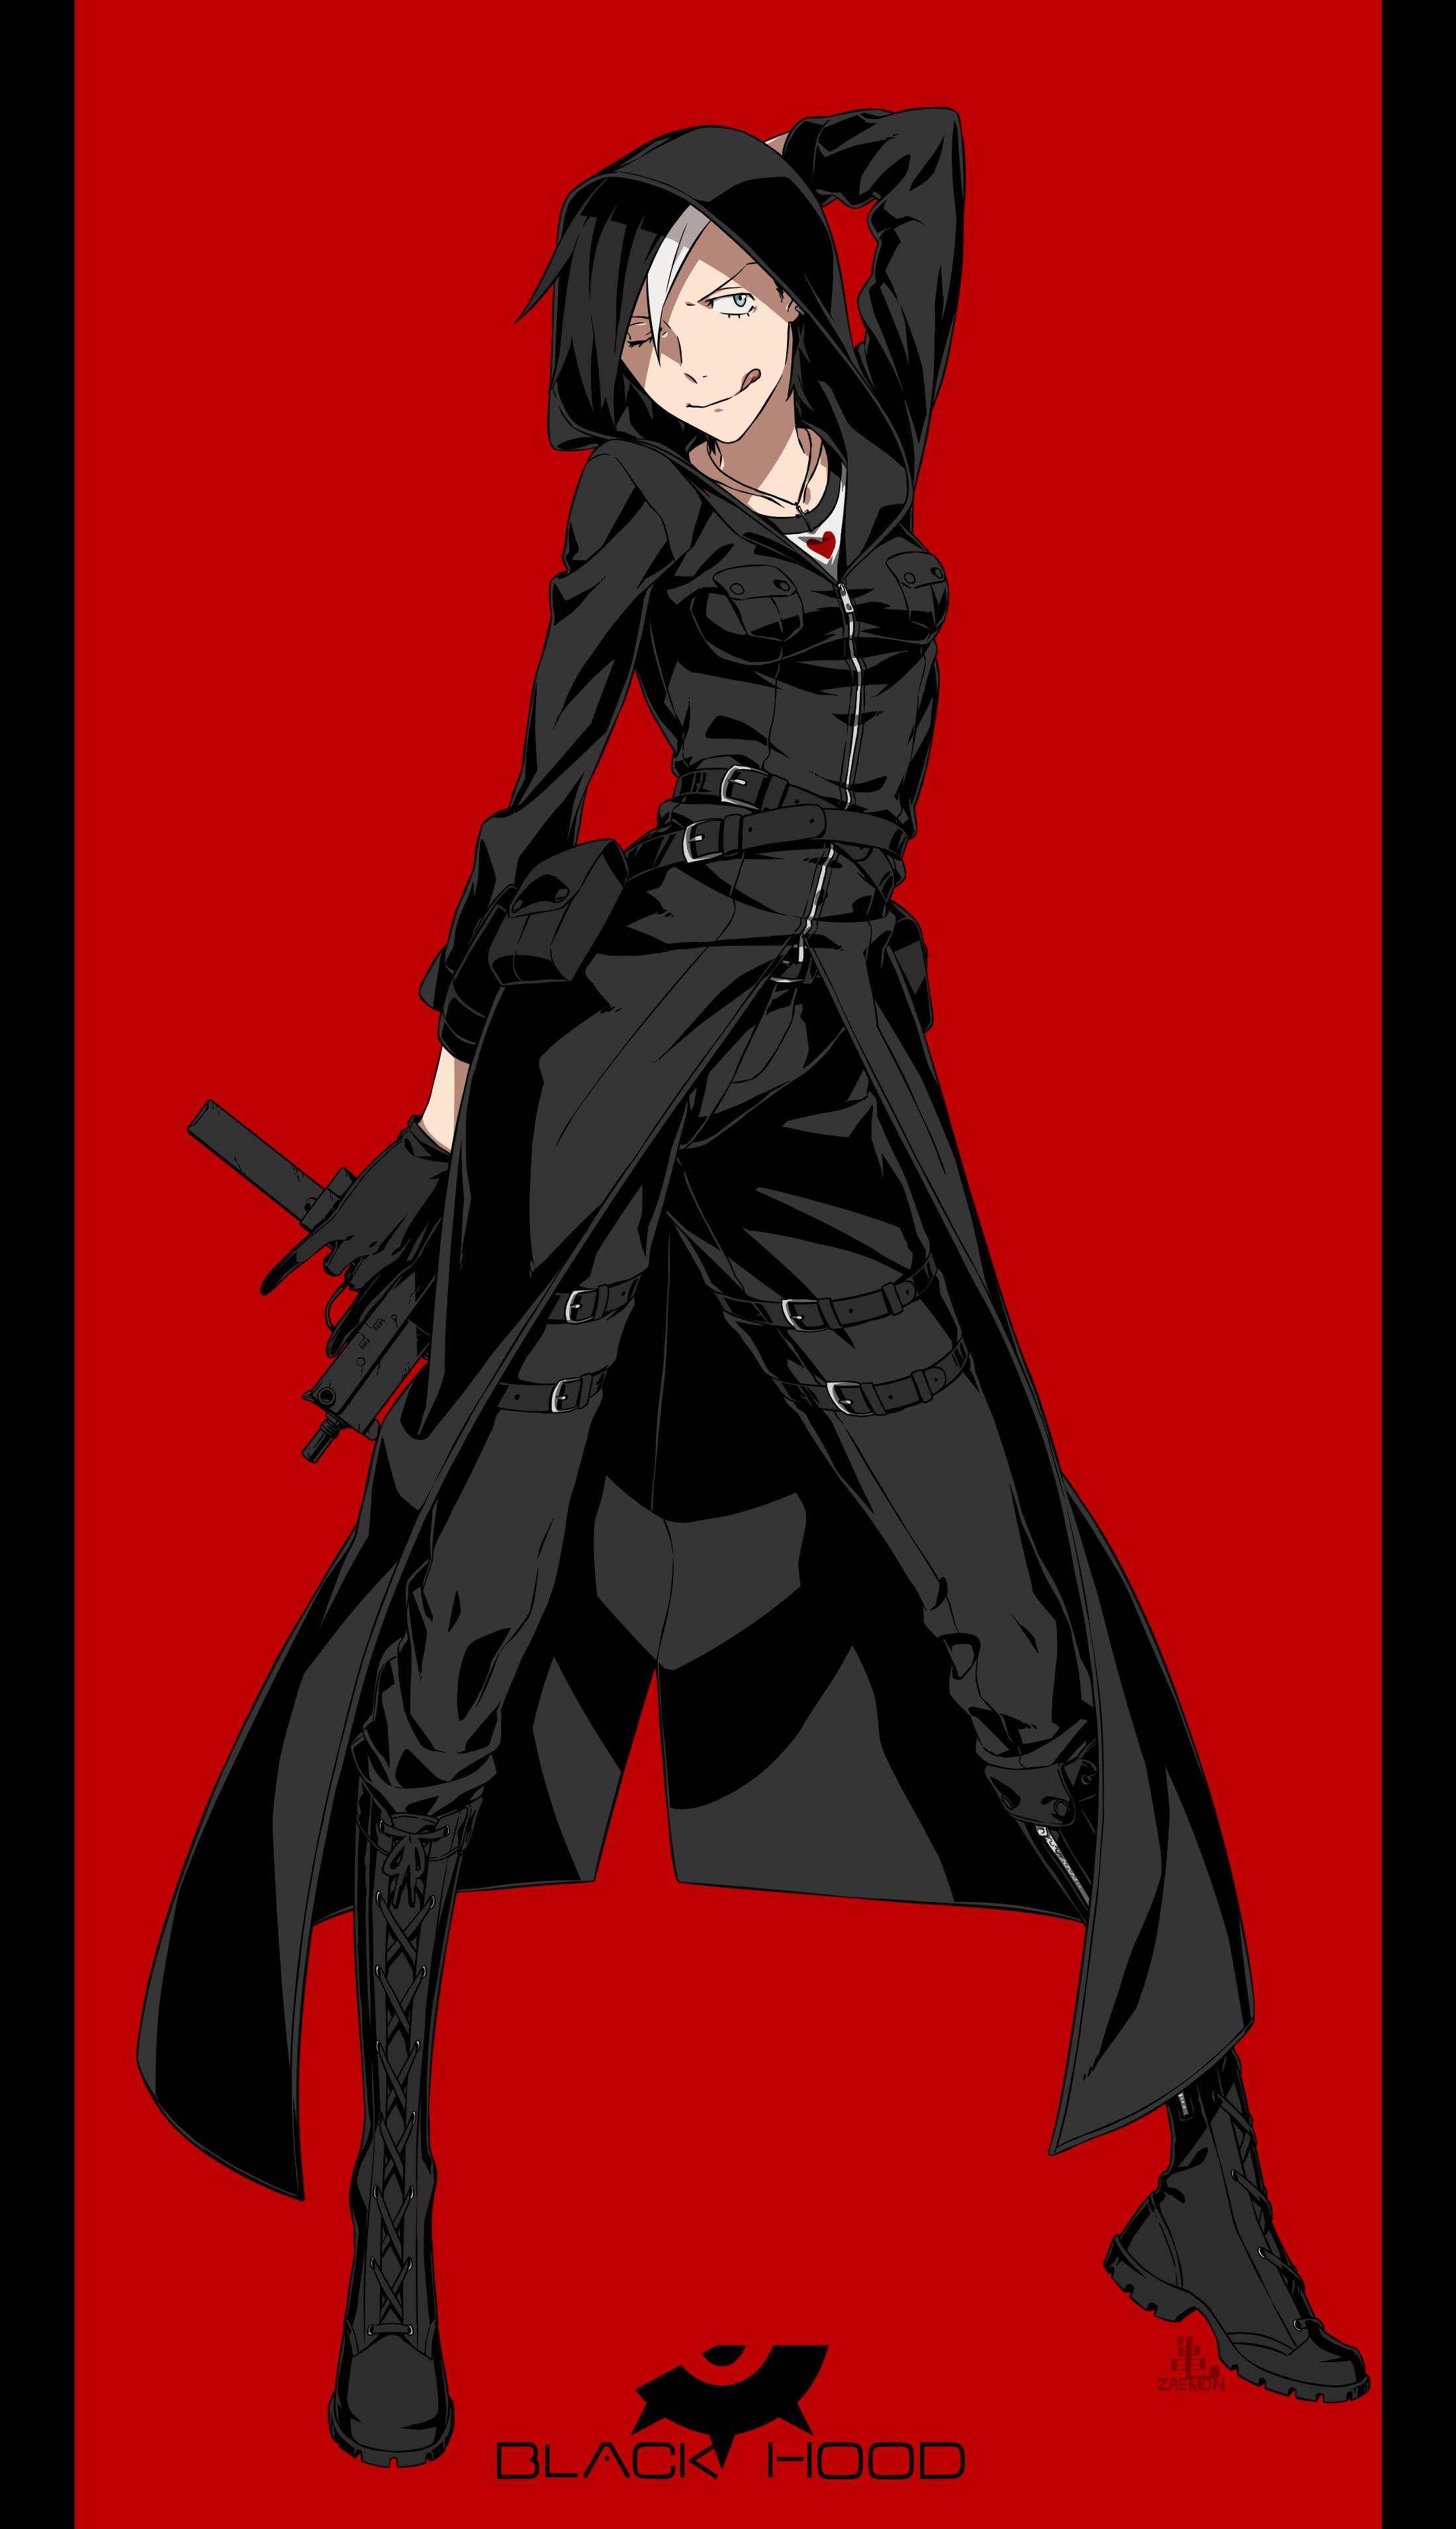 Inverse Ritsuko [Approved Soul Evo Human: Tier 3-5] __black_hood_original_drawn_by_kamezaemon__561d90dee2b442db2051bfd22464b56f